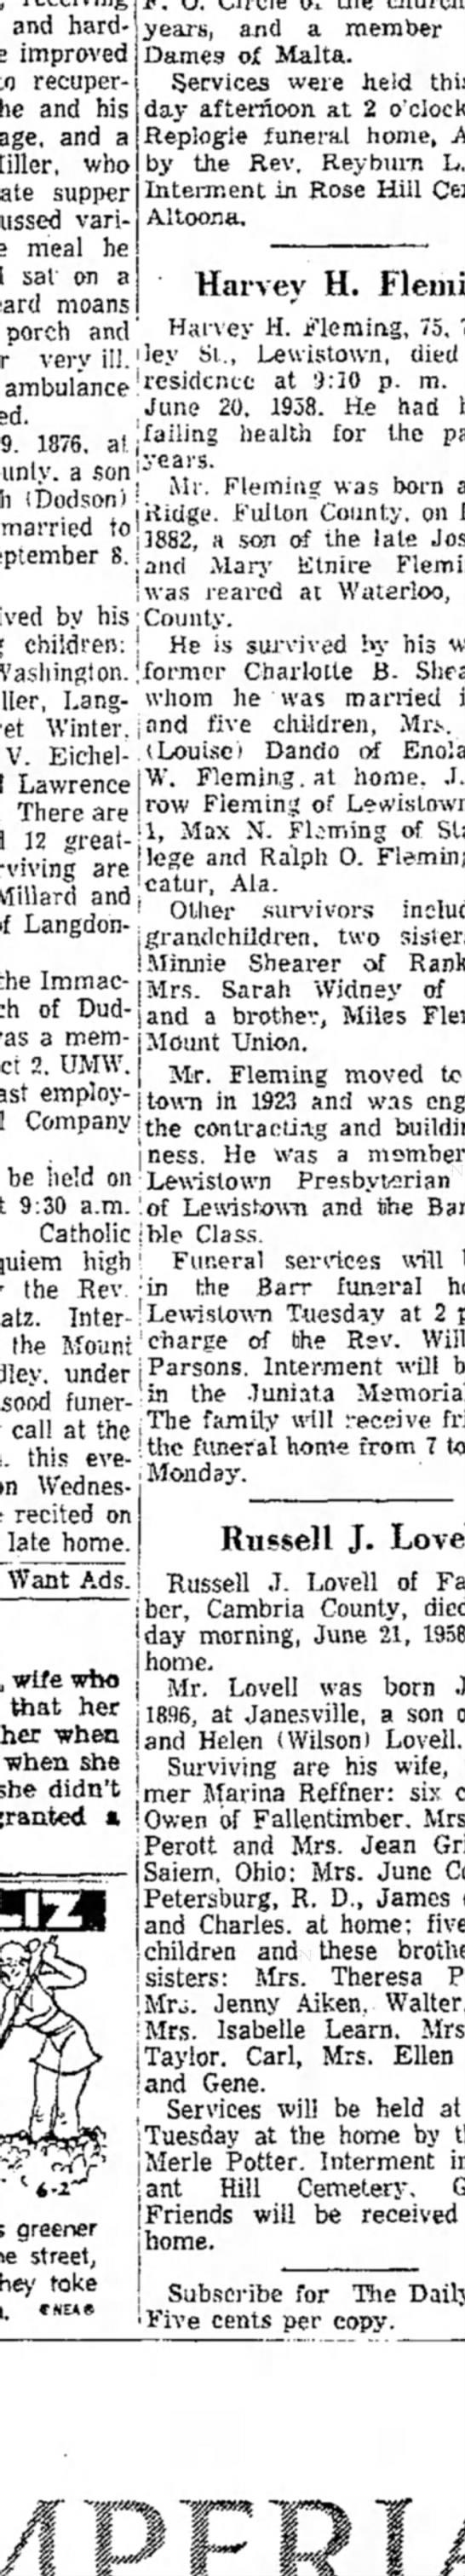 June 23, 1958 -